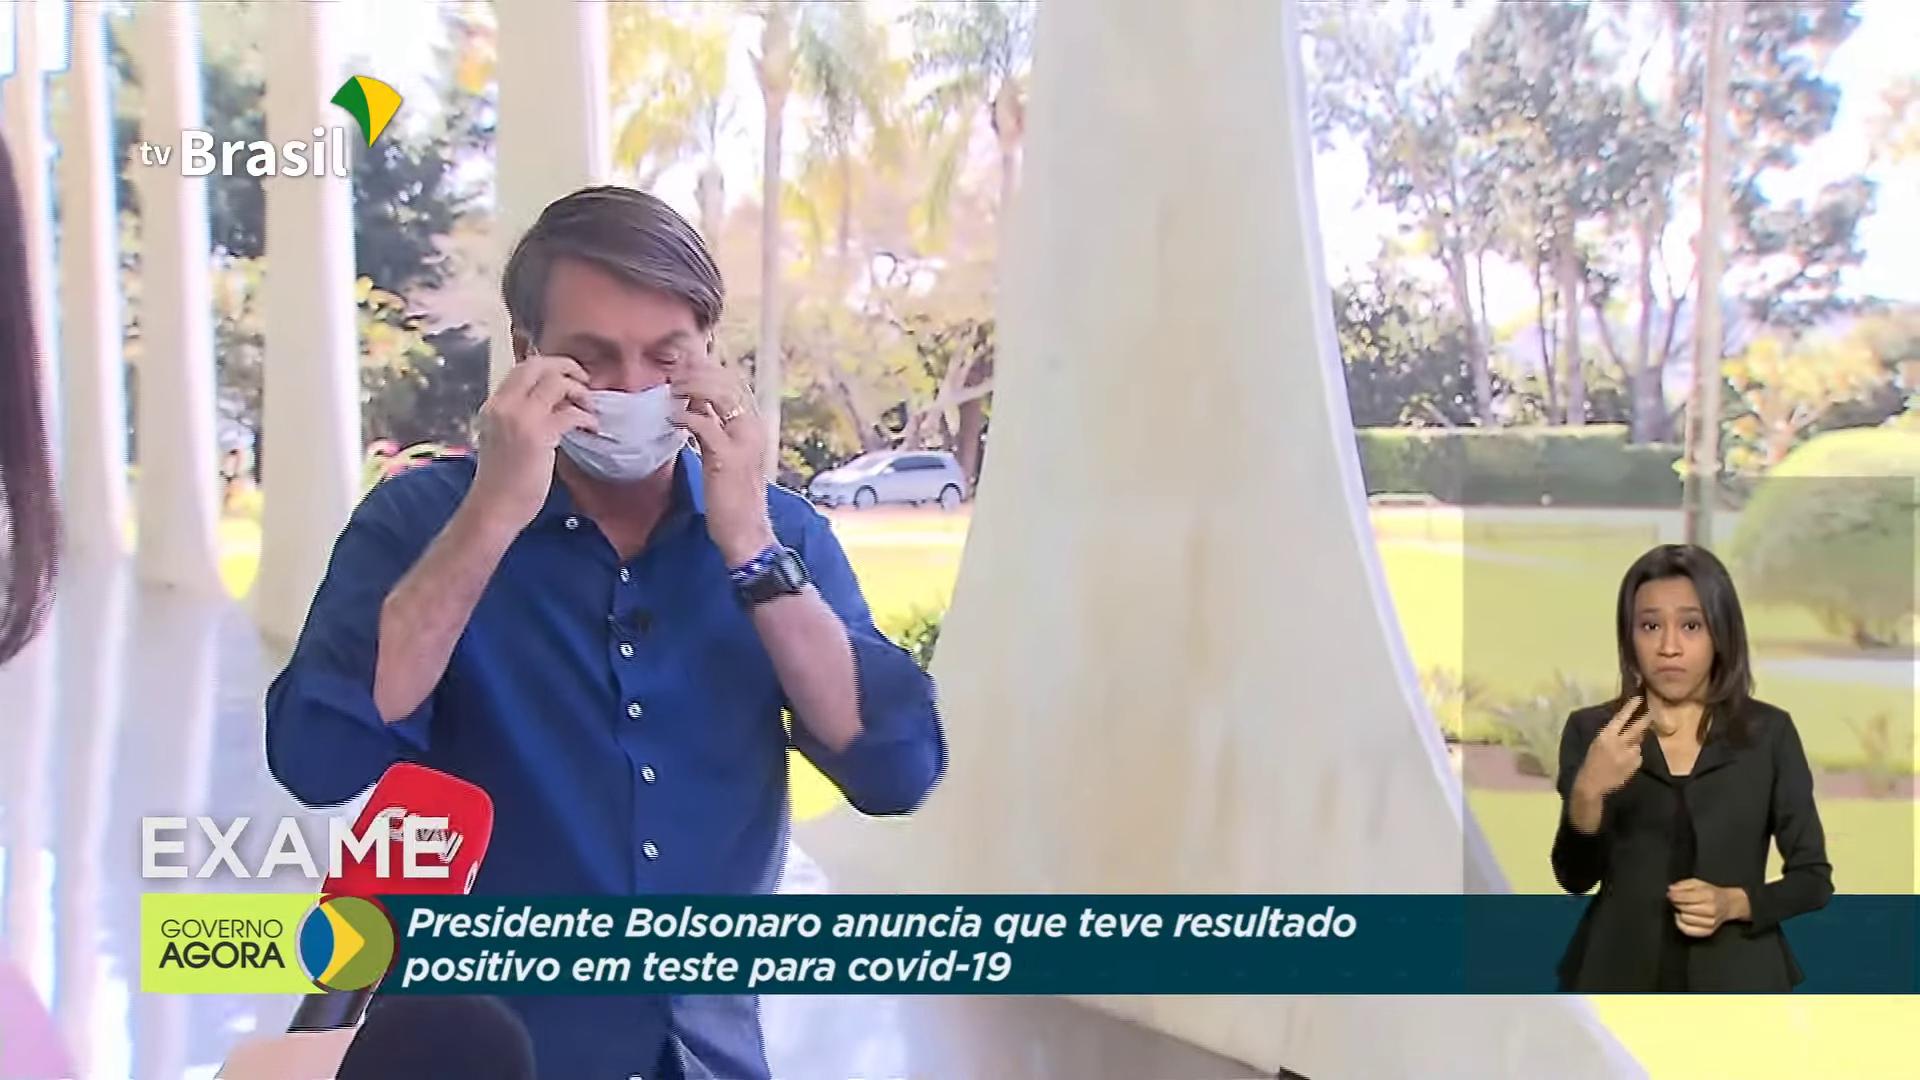 Imagem via Palácio Planalto/YouTube